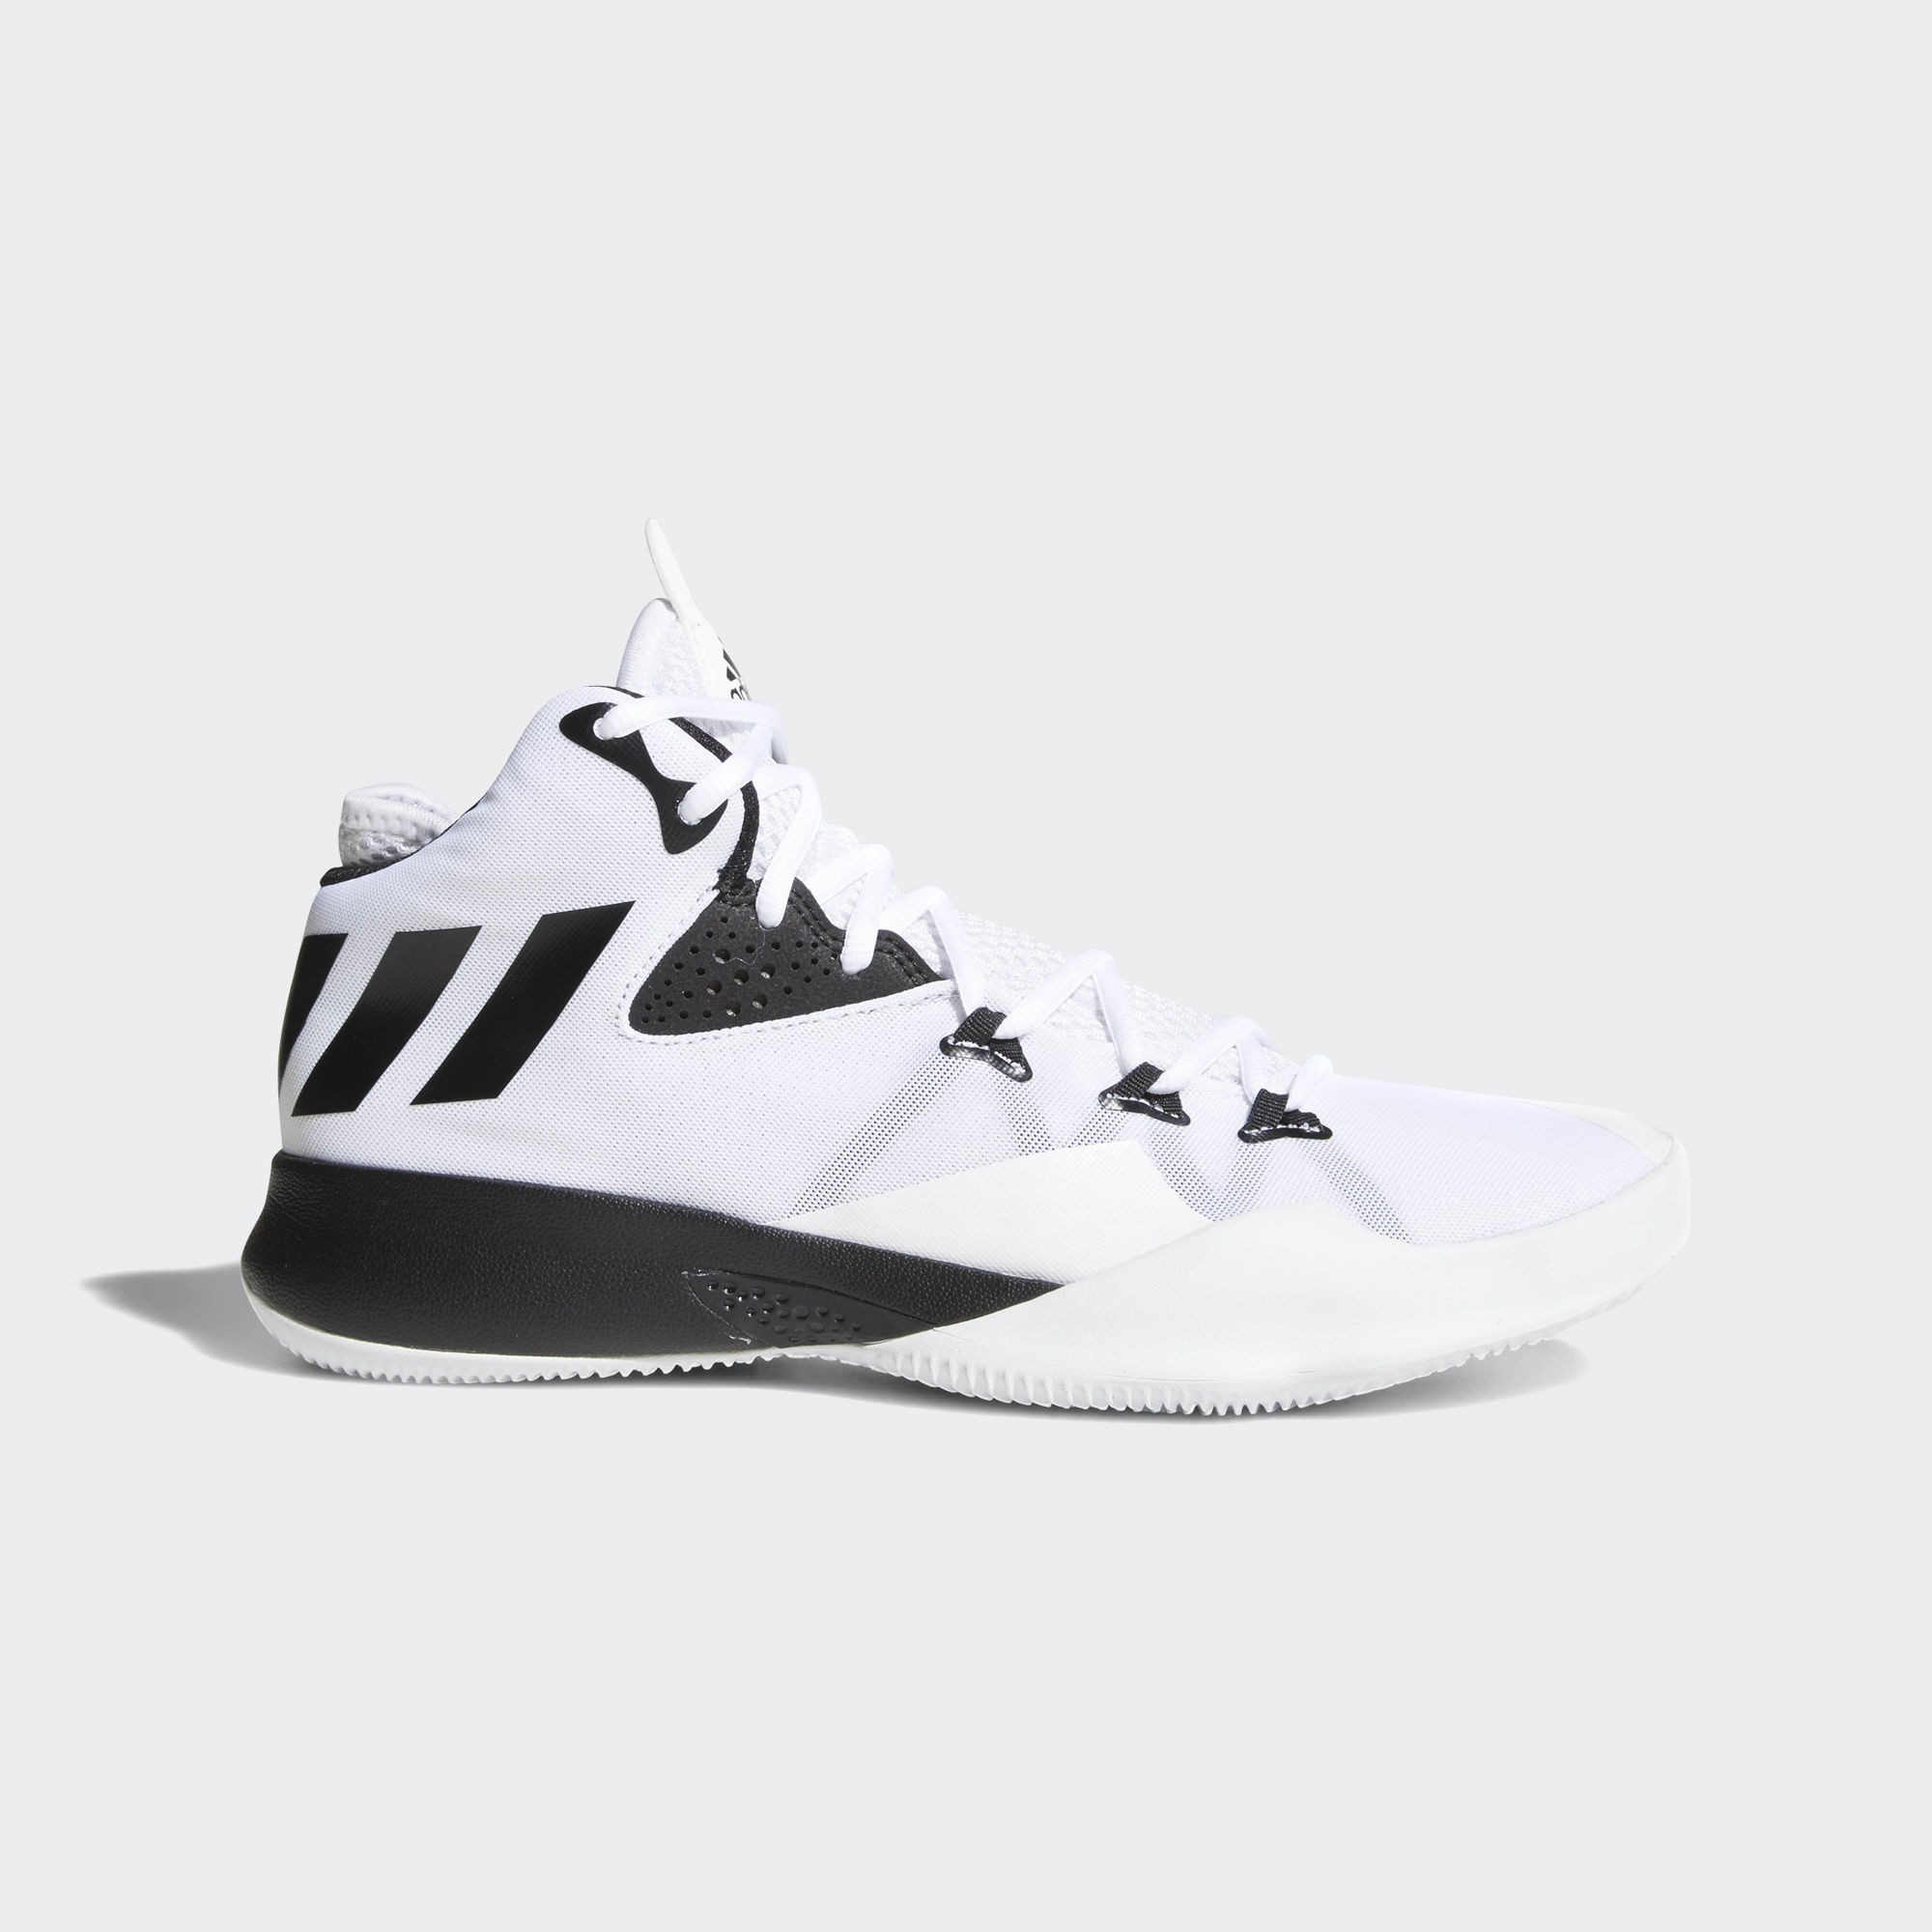 Trueno fax medallista  Zapatillas Baloncesto adidas Dual Threat 2017 BB8377 - Deportes Manzanedo